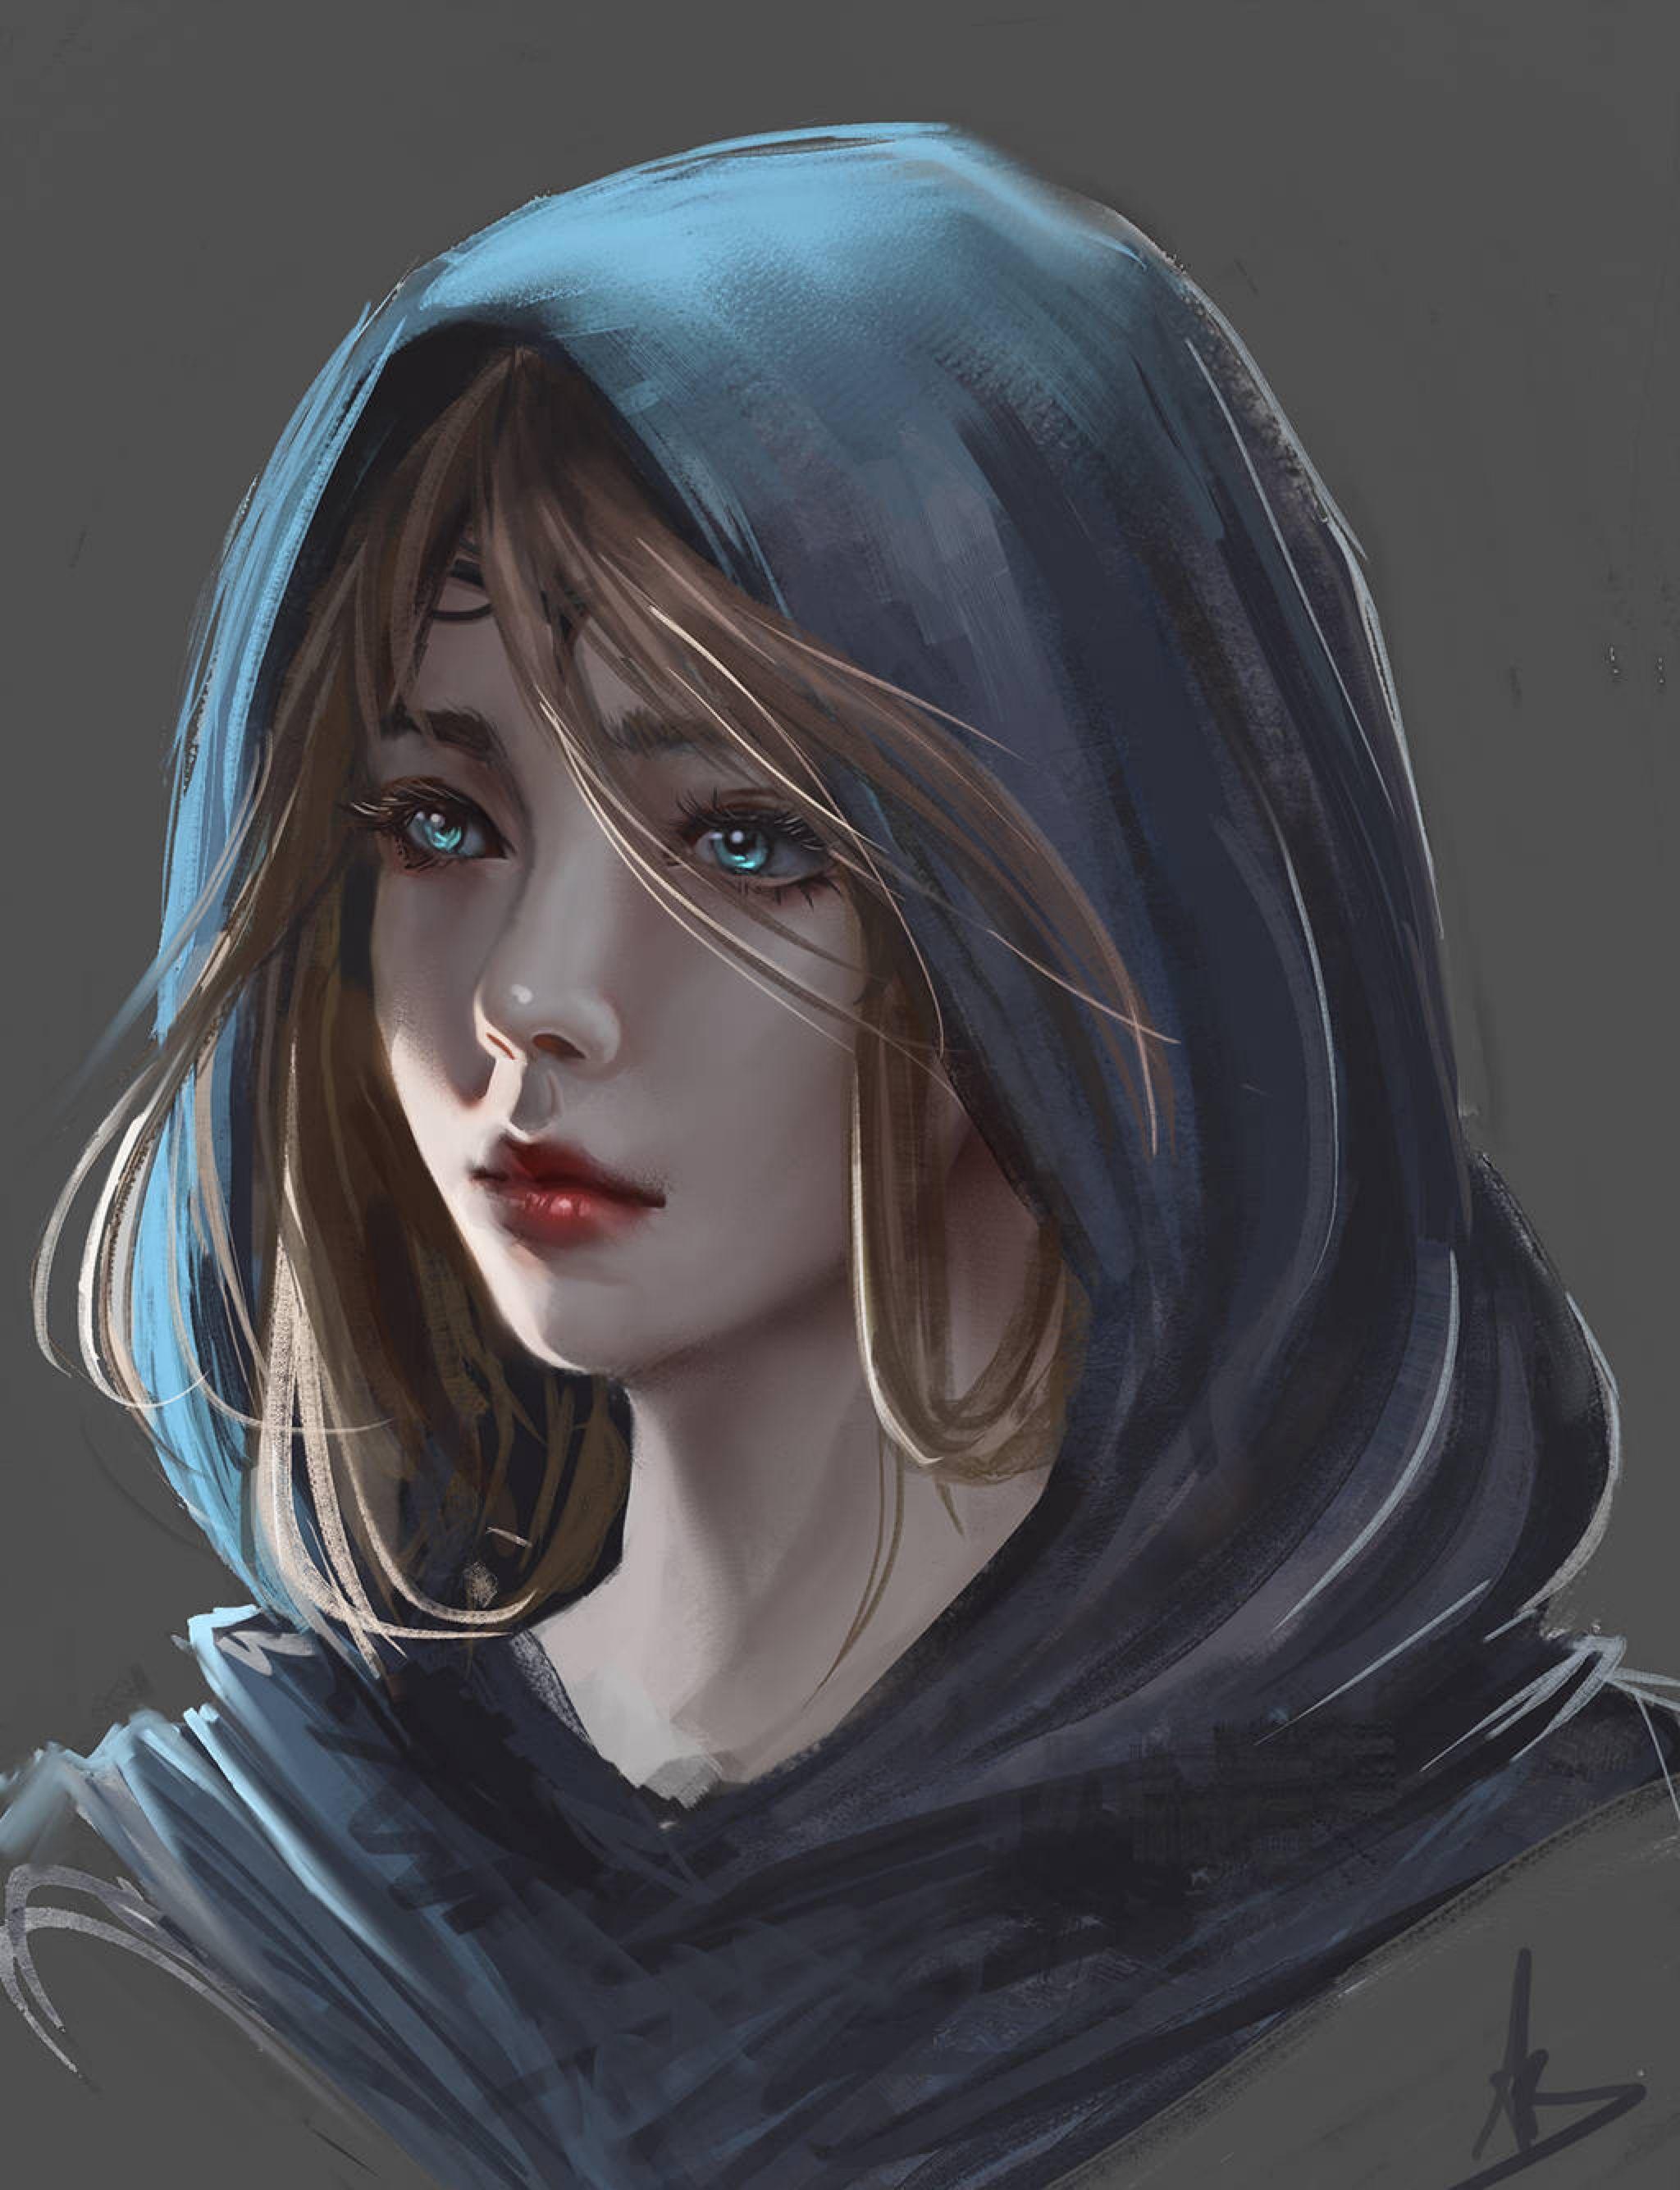 Doodle By Trungbui42 On Deviantart Digital Art Girl Art Girl Concept Art Characters